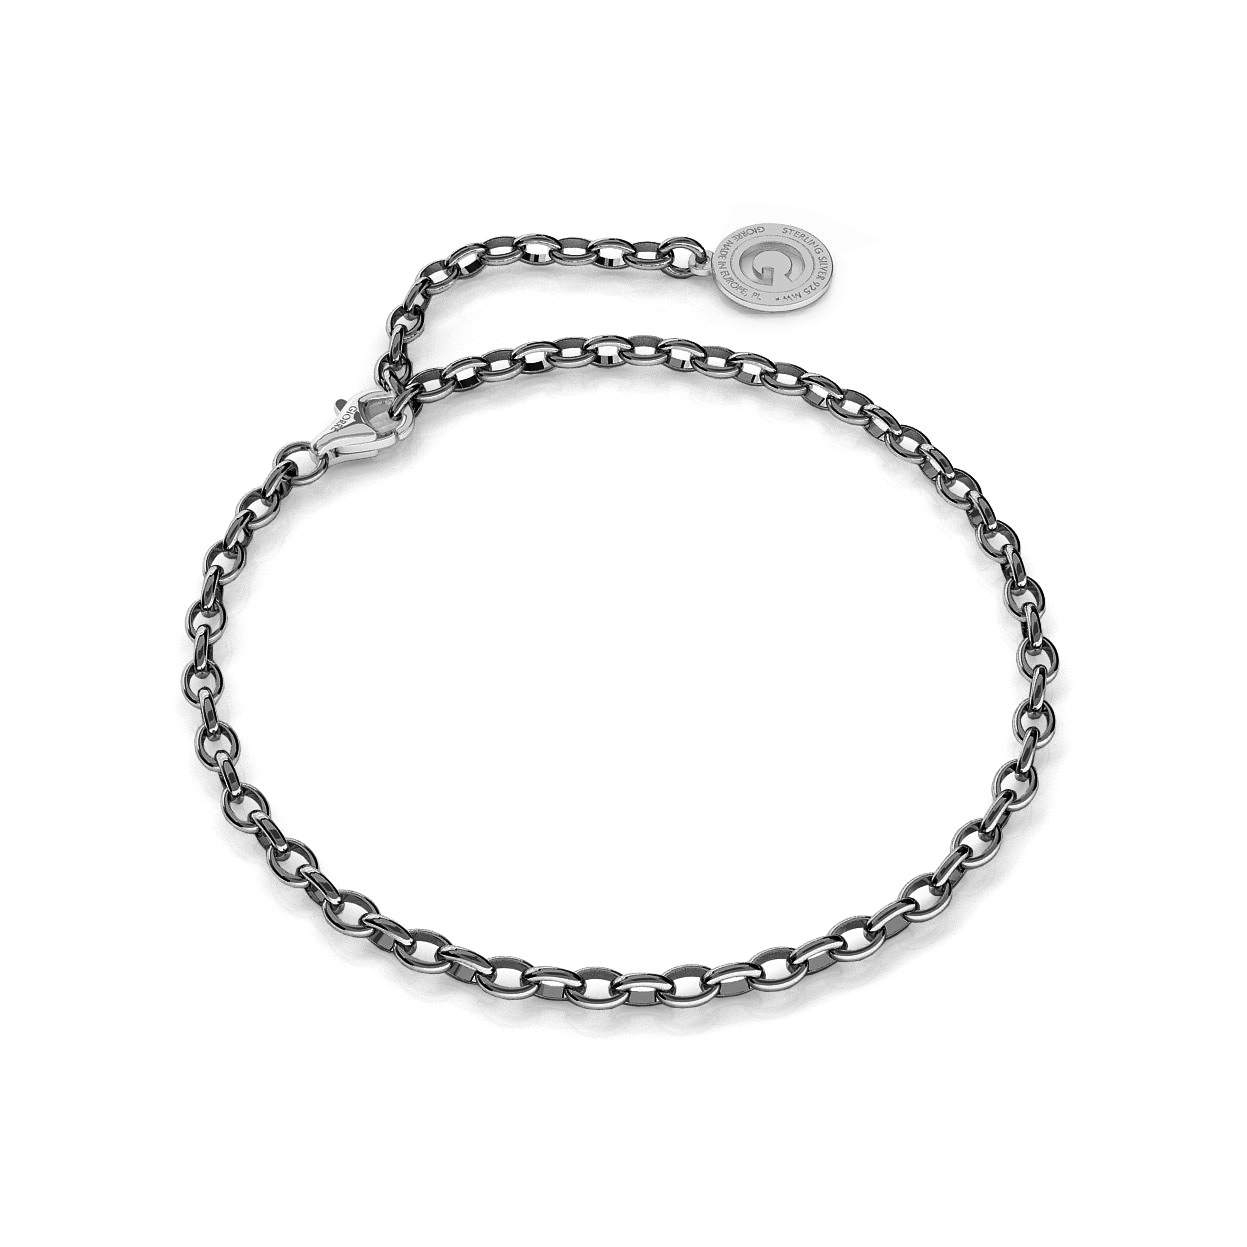 Sterling silver bracelet 16-24 cm black rhodium, light rhodium clasp, link 4x3 mm